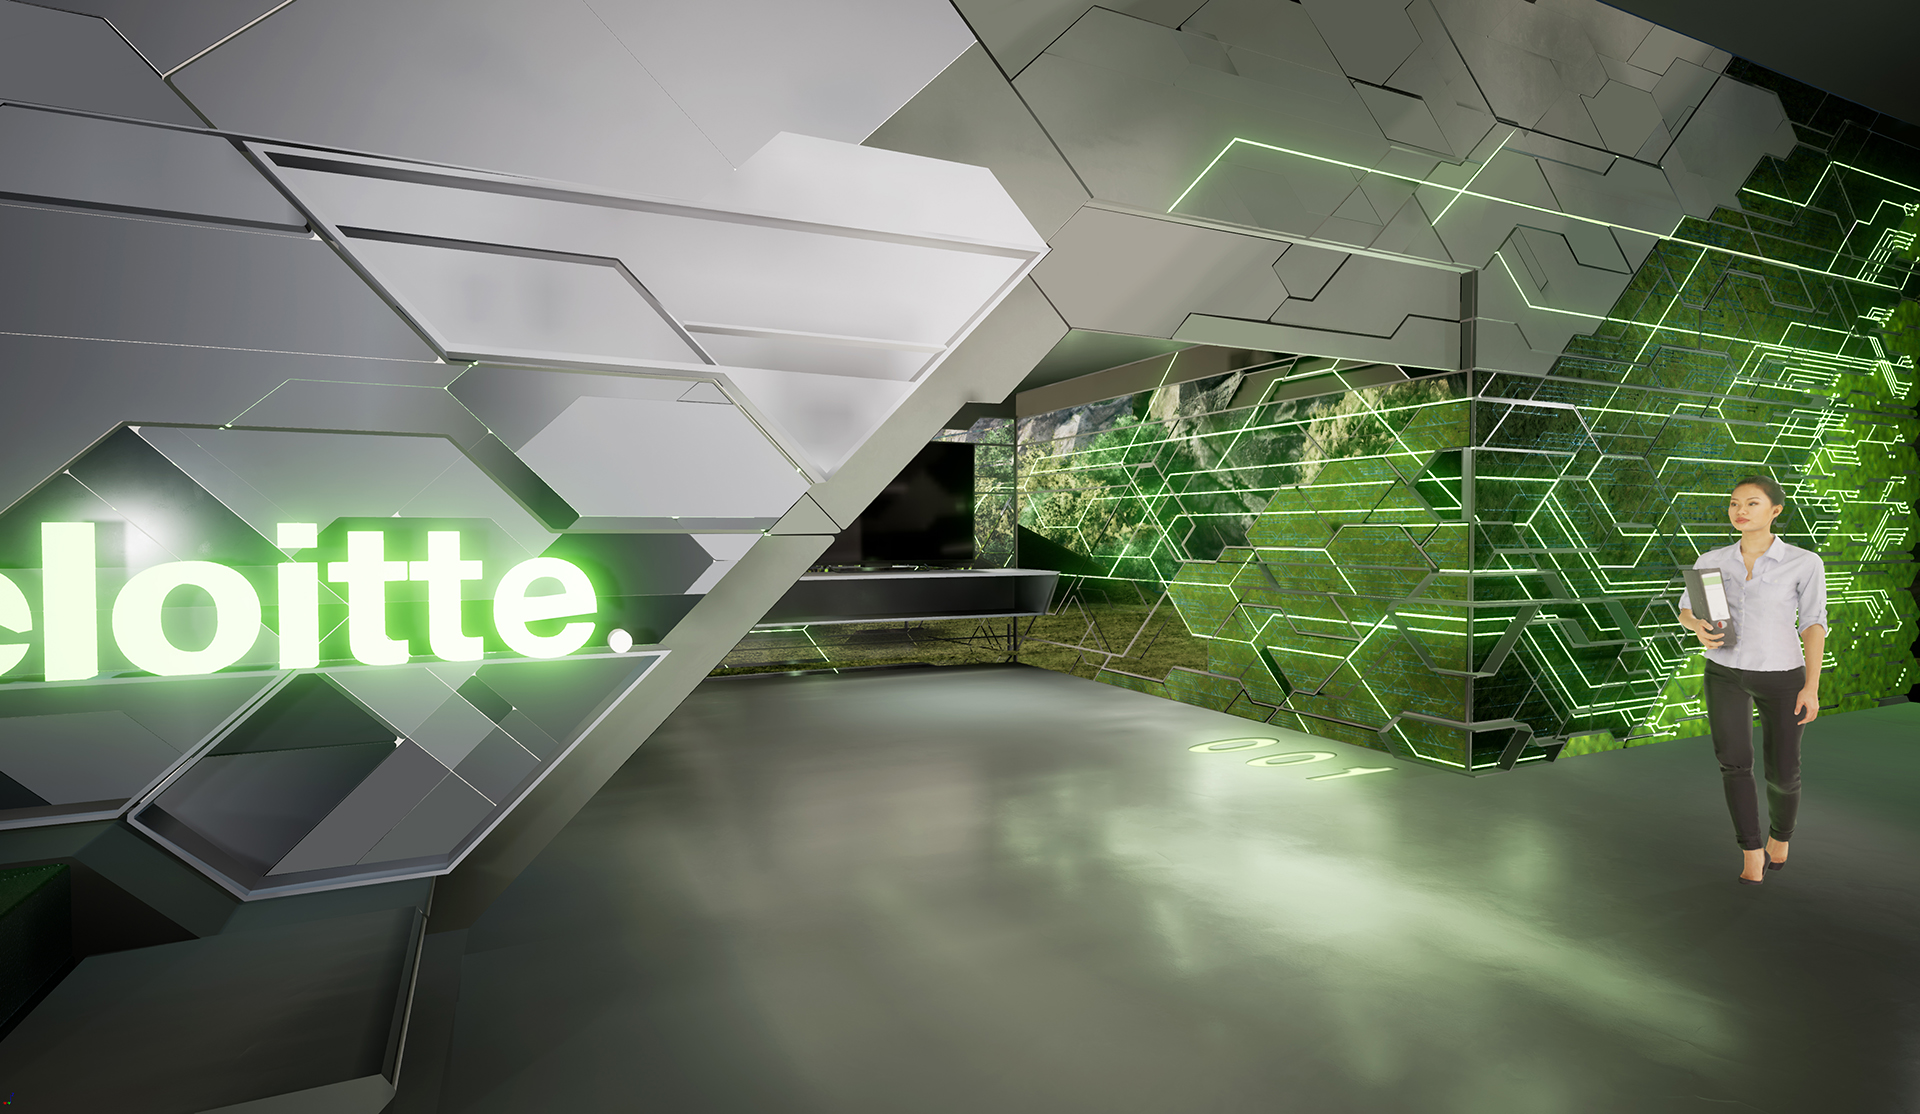 Deloitte_16_small.jpg